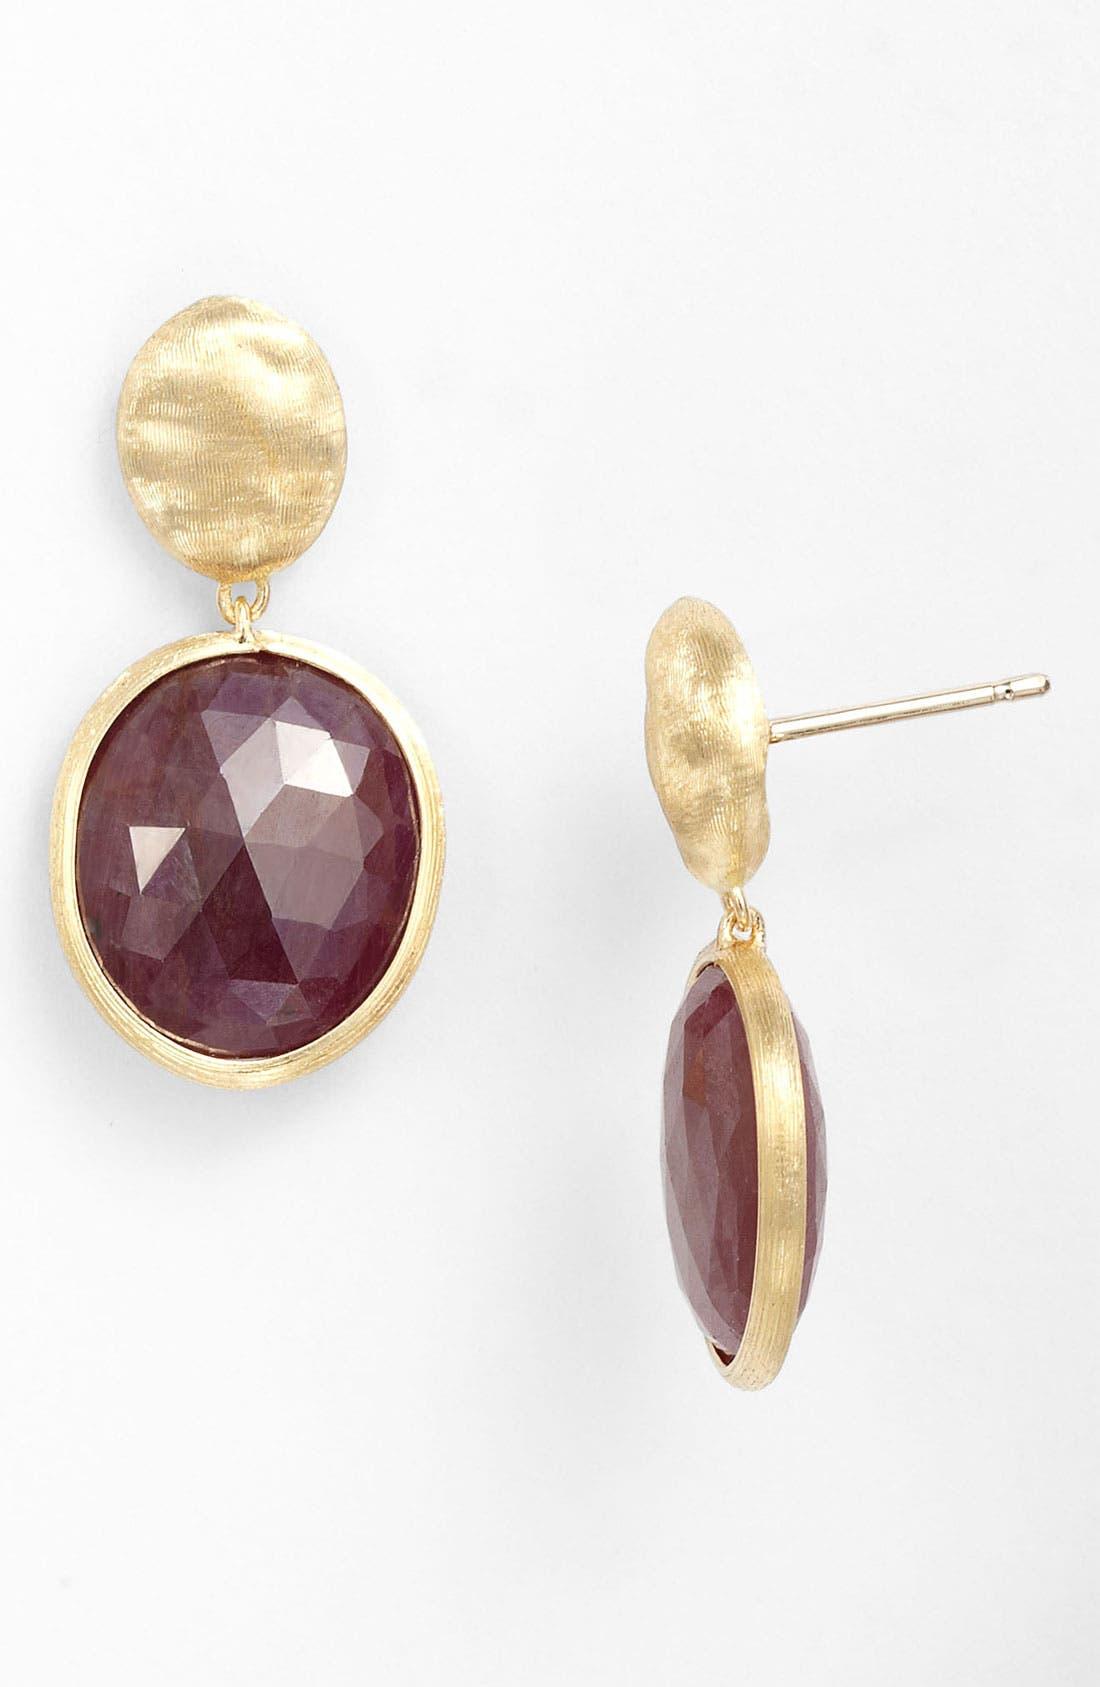 Main Image - Marco Bicego 'Siviglia' Sapphire Drop Earrings